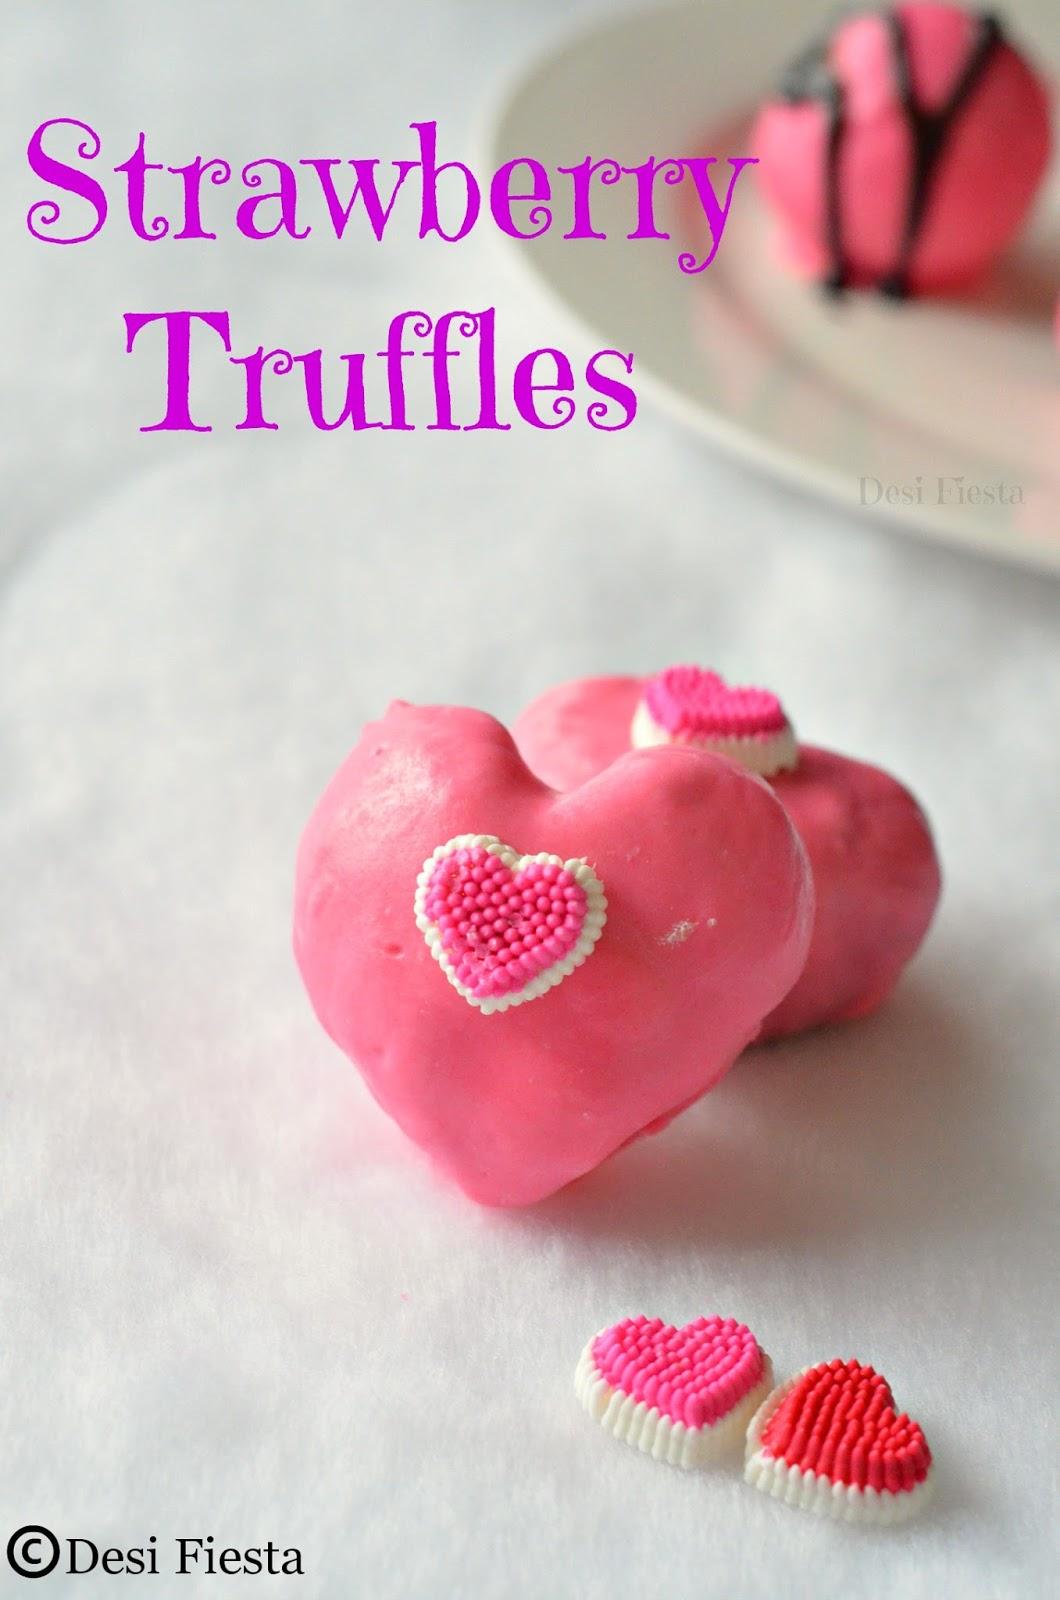 Heart shaped Truffles